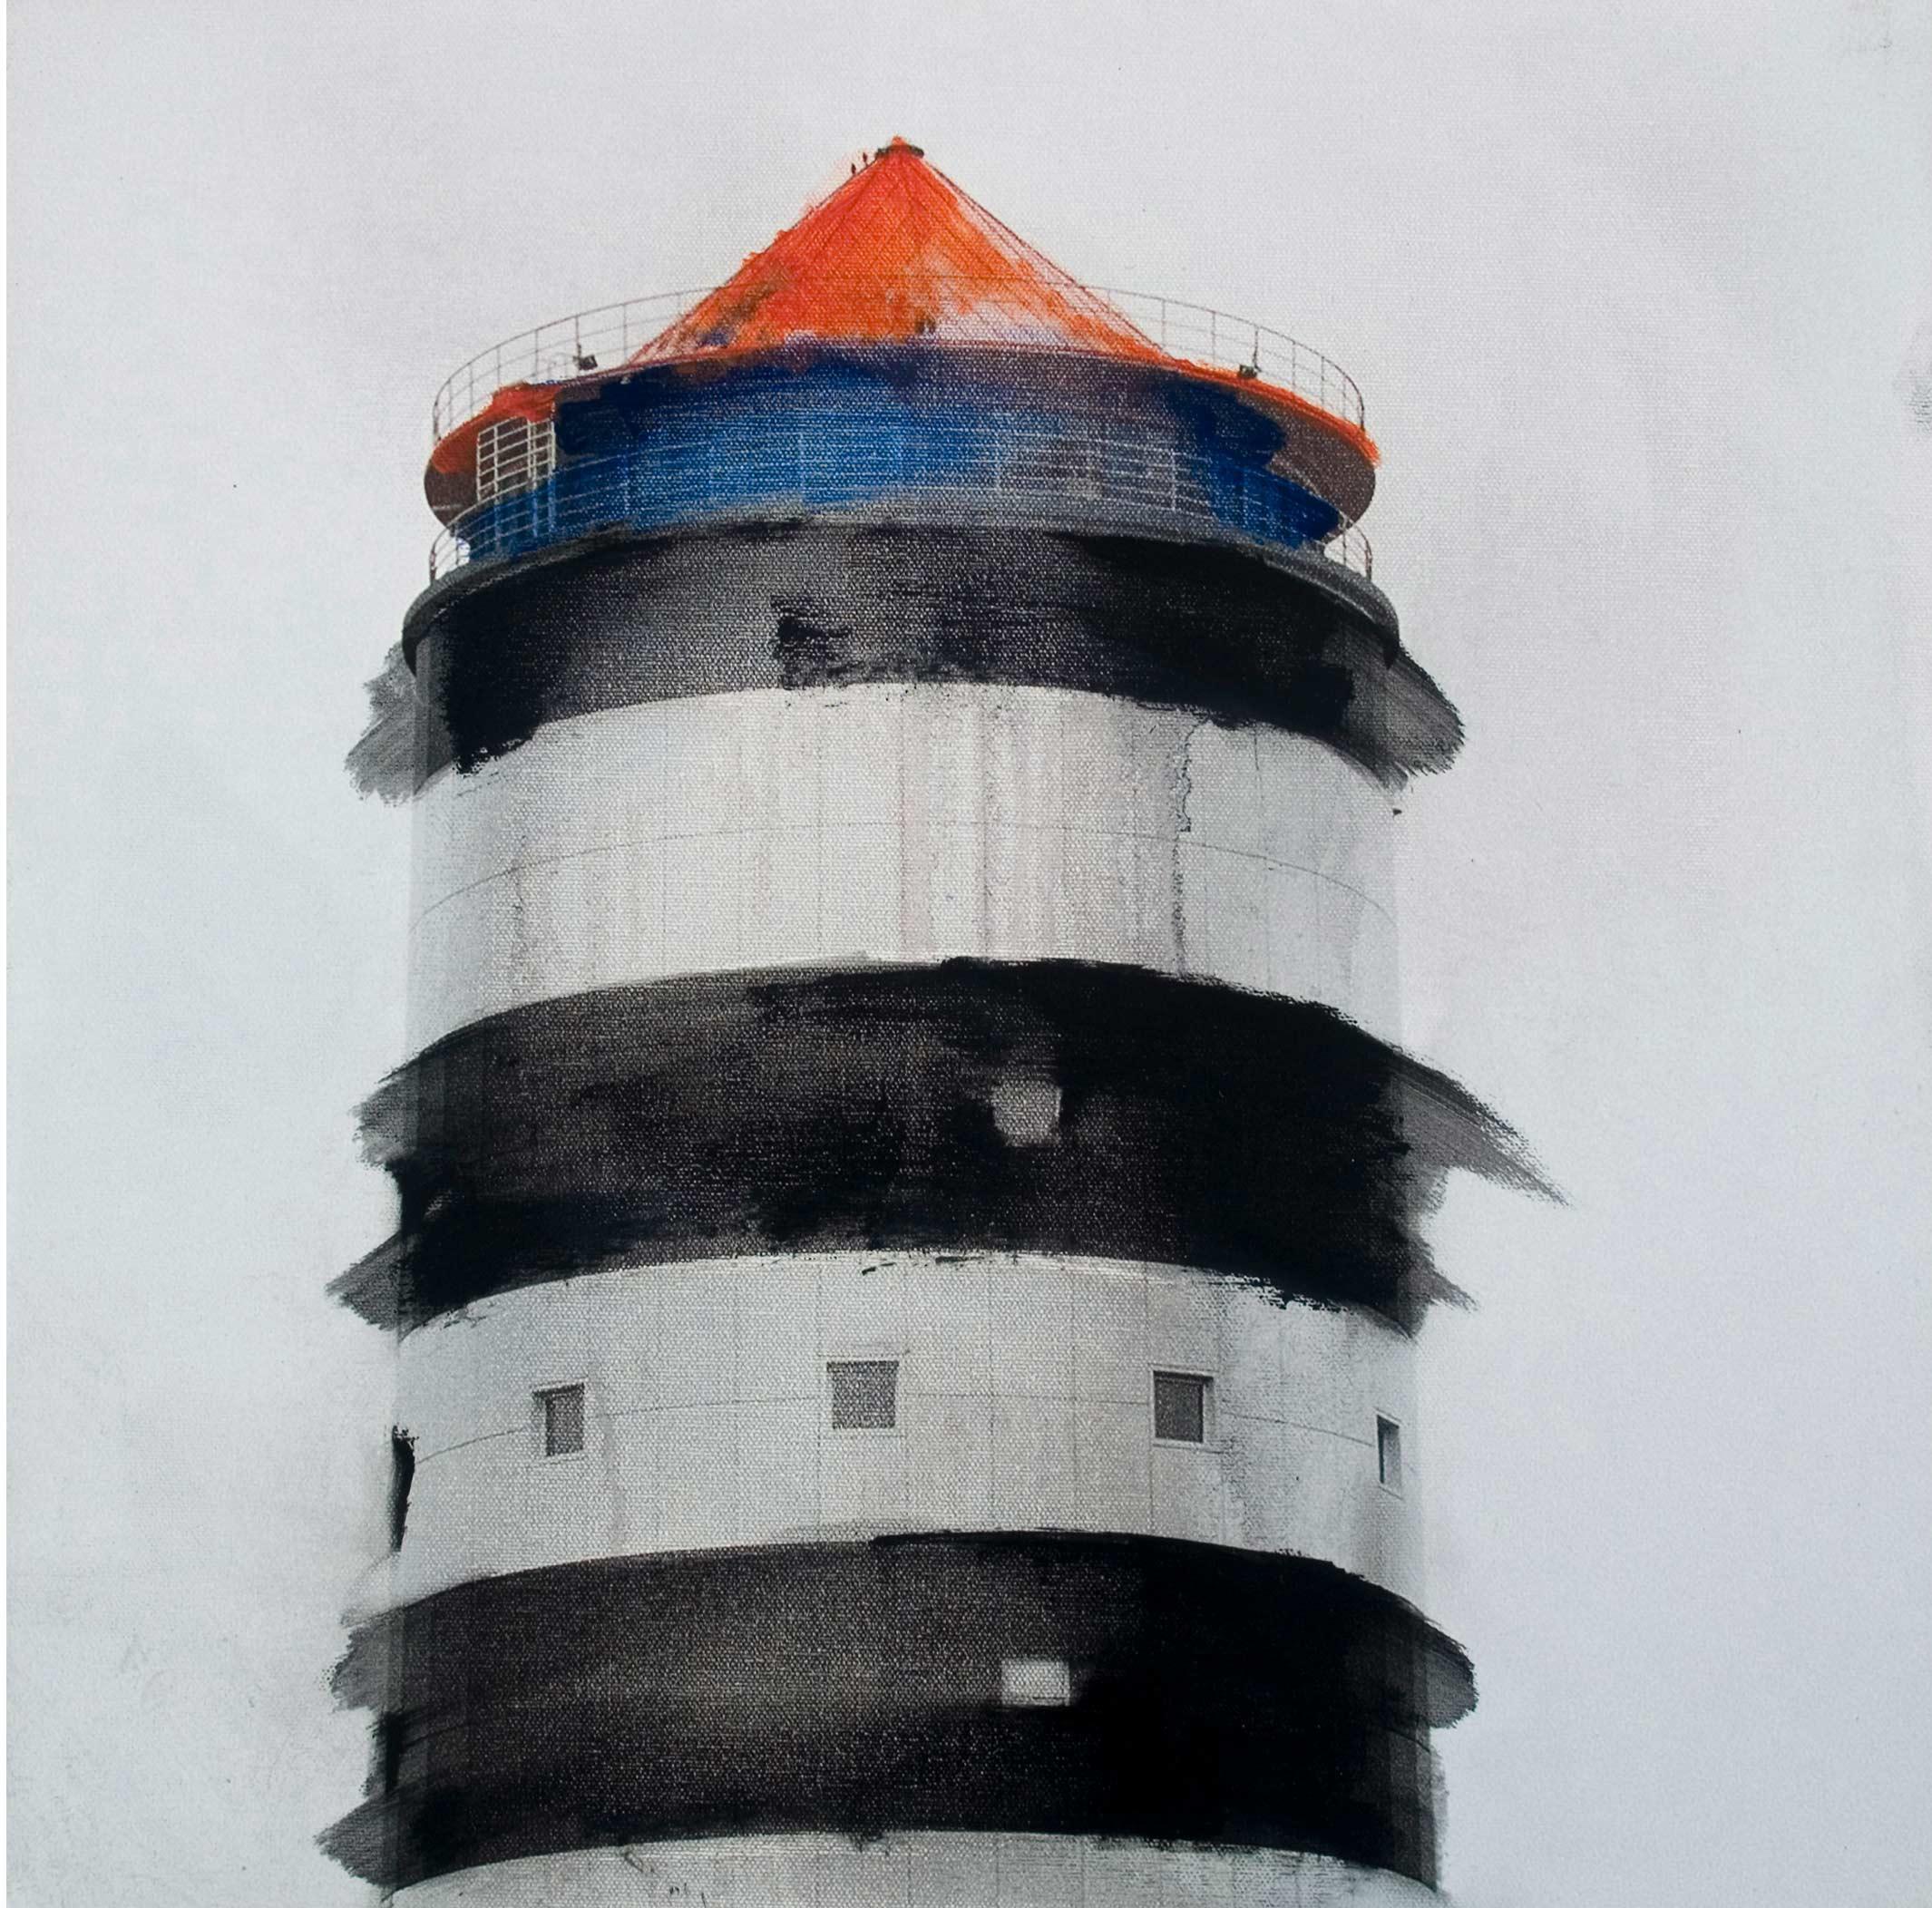 Faros, torres y chimeneas V